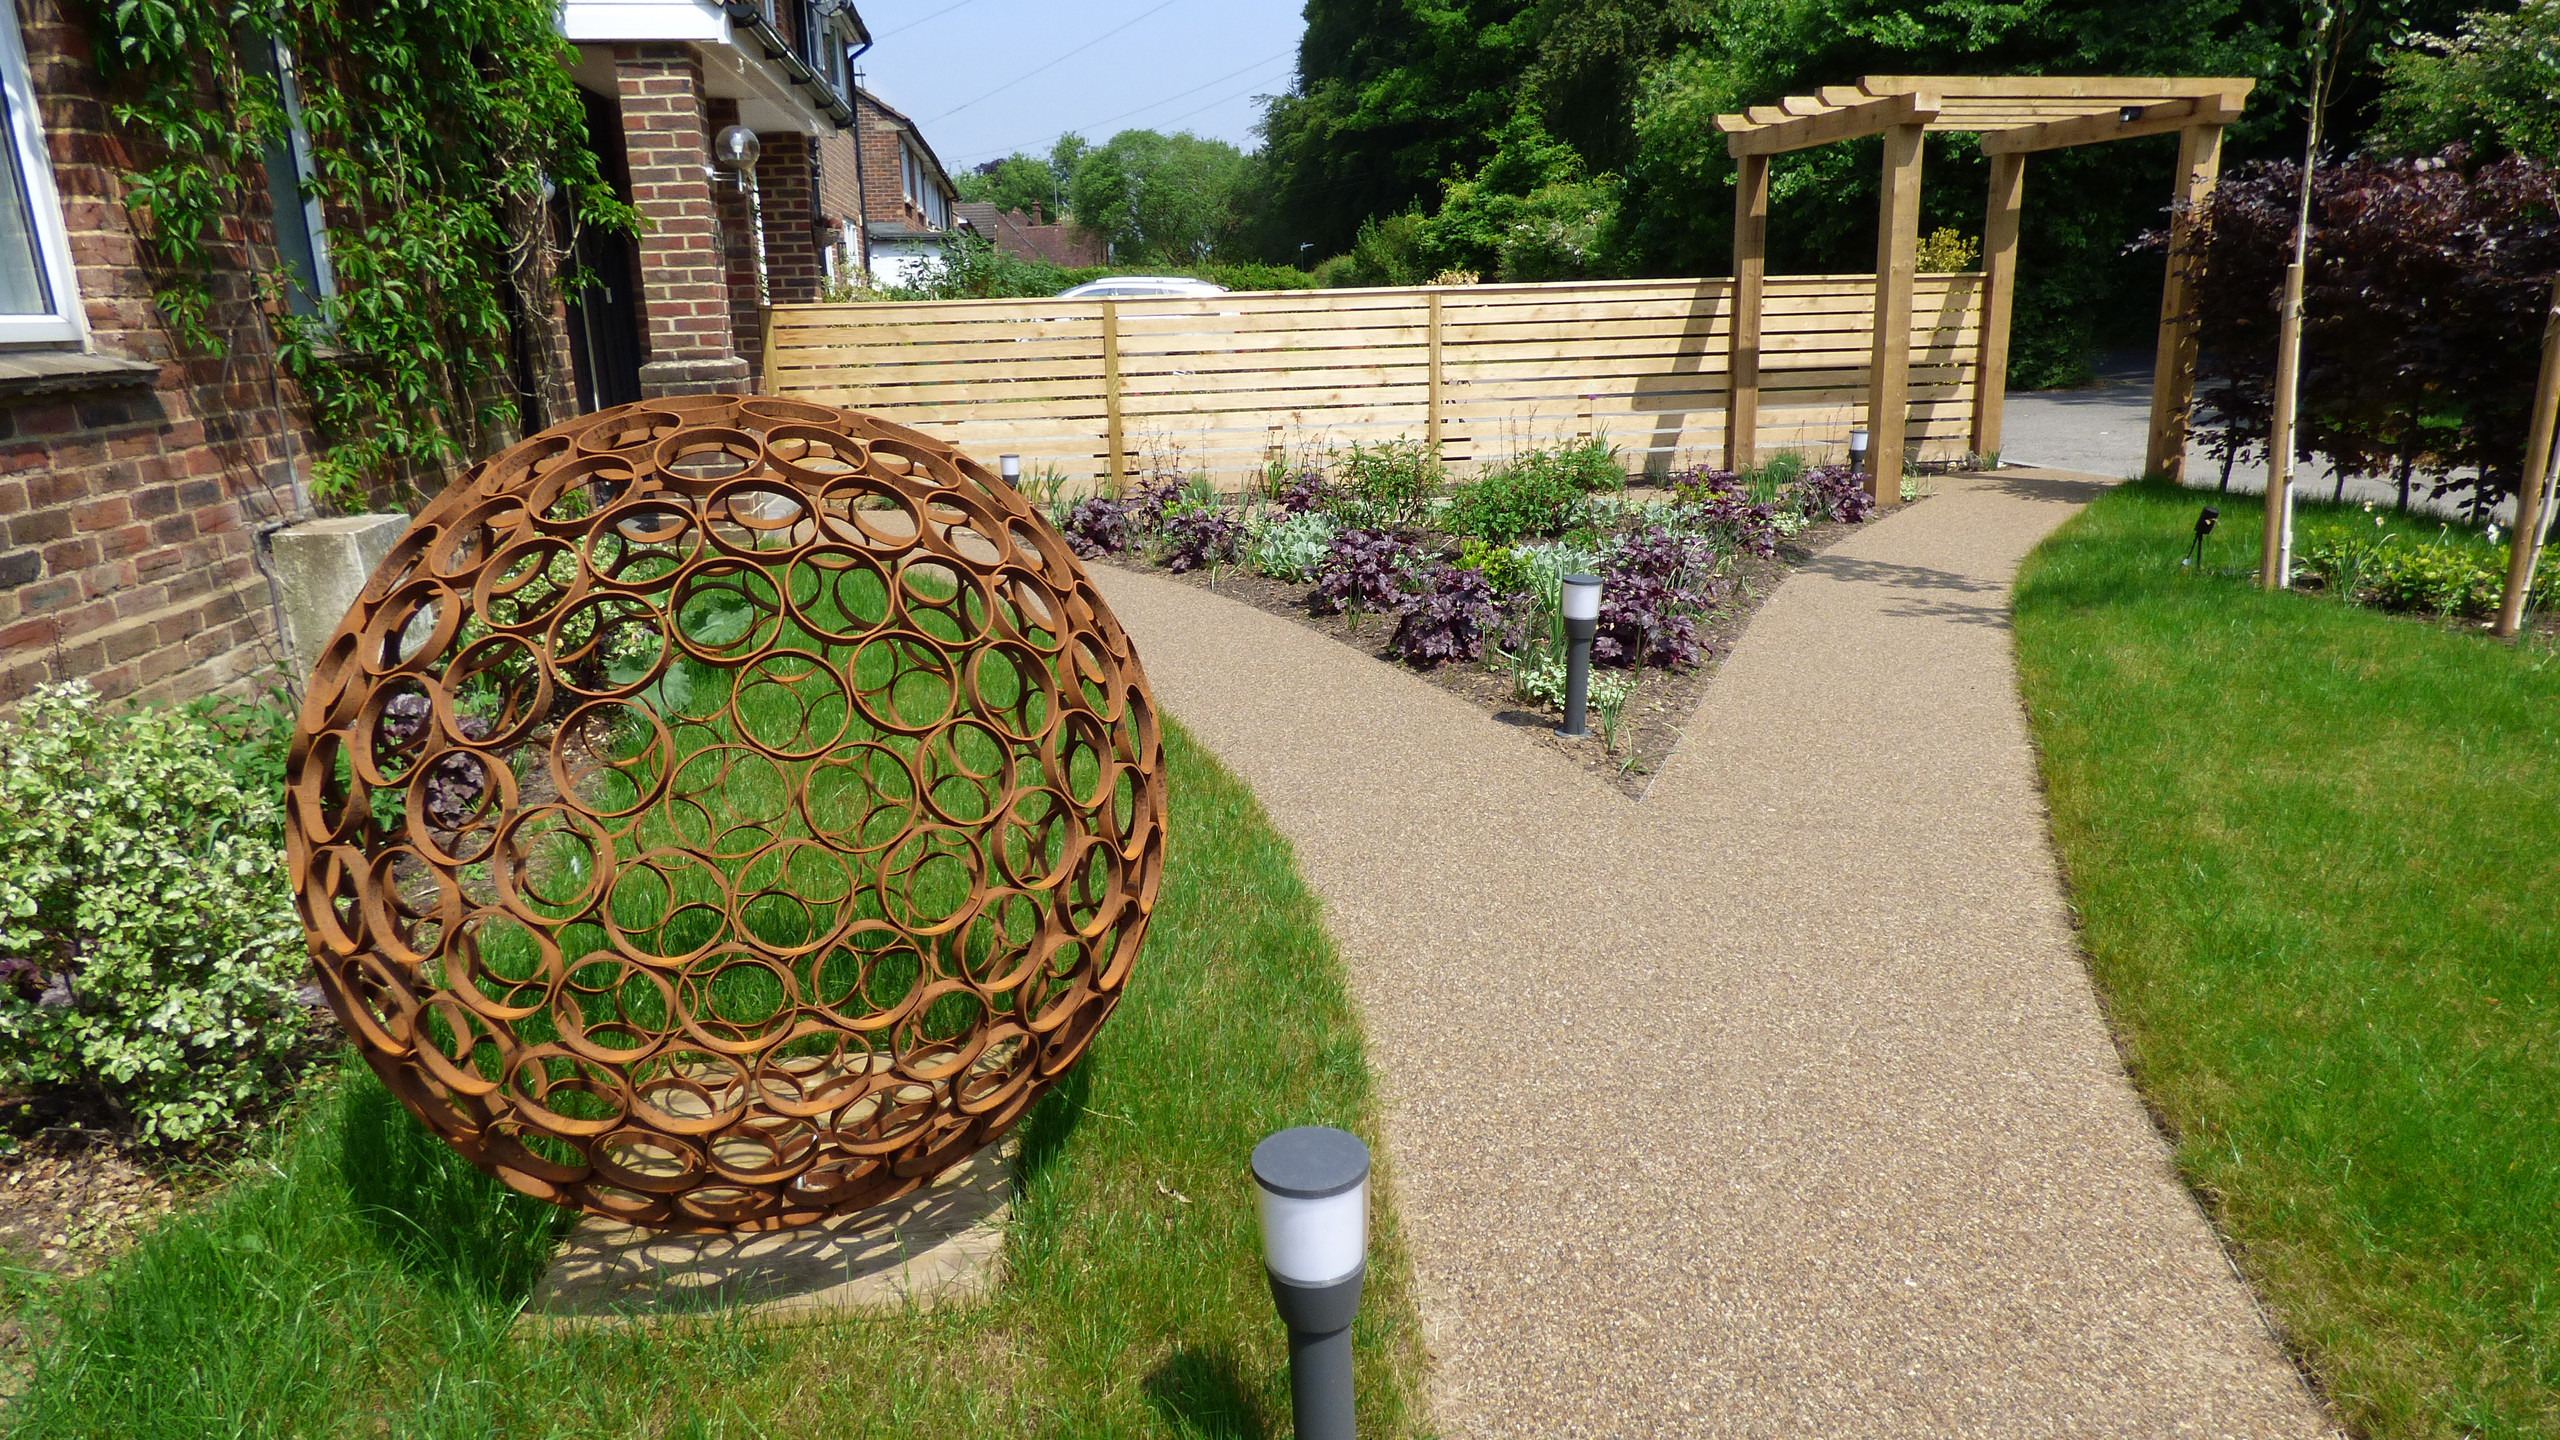 Relandscaped a front garden